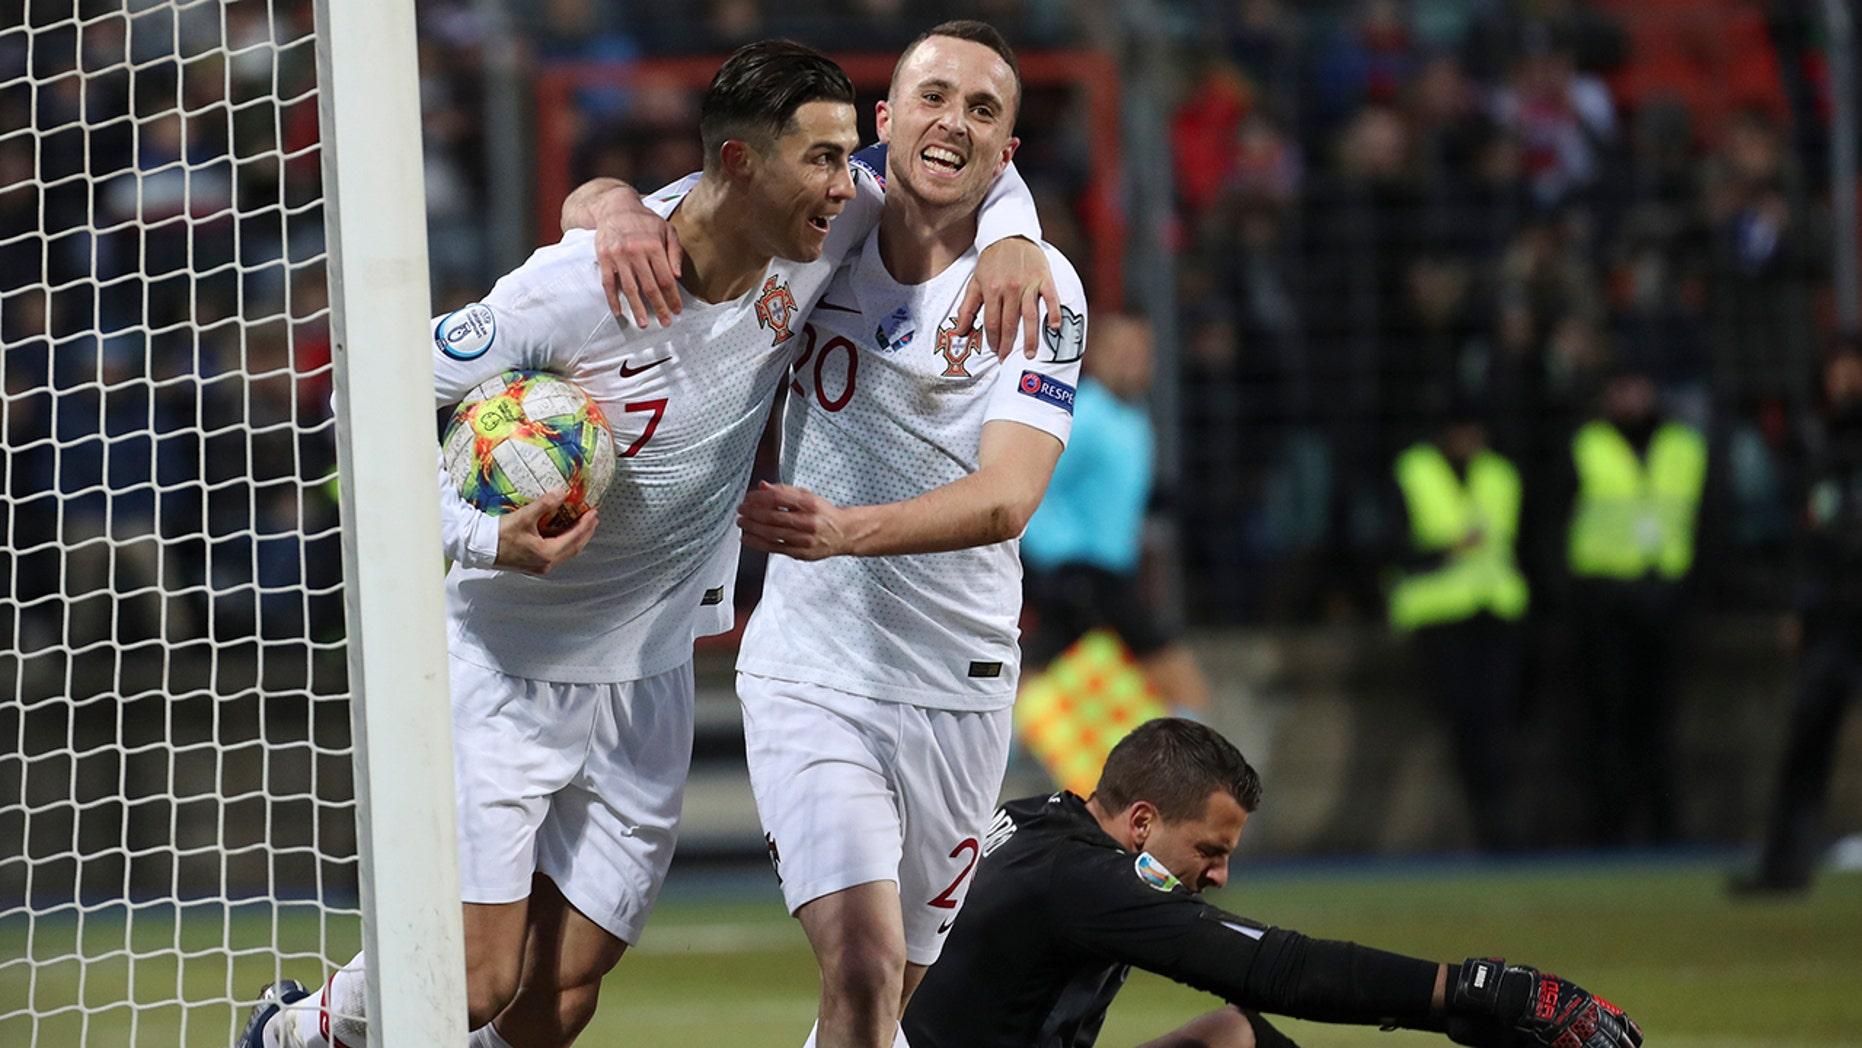 Westlake Legal Group Cristiano-Ronaldo Ronaldo stuck on 99 goals but Portugal through to Euro 2020 fox-news/sports/soccer fox-news/person/cristiano-ronaldo fnc/sports fnc Associated Press article 3a198dec-28e4-5535-b0e0-75c0485245c4